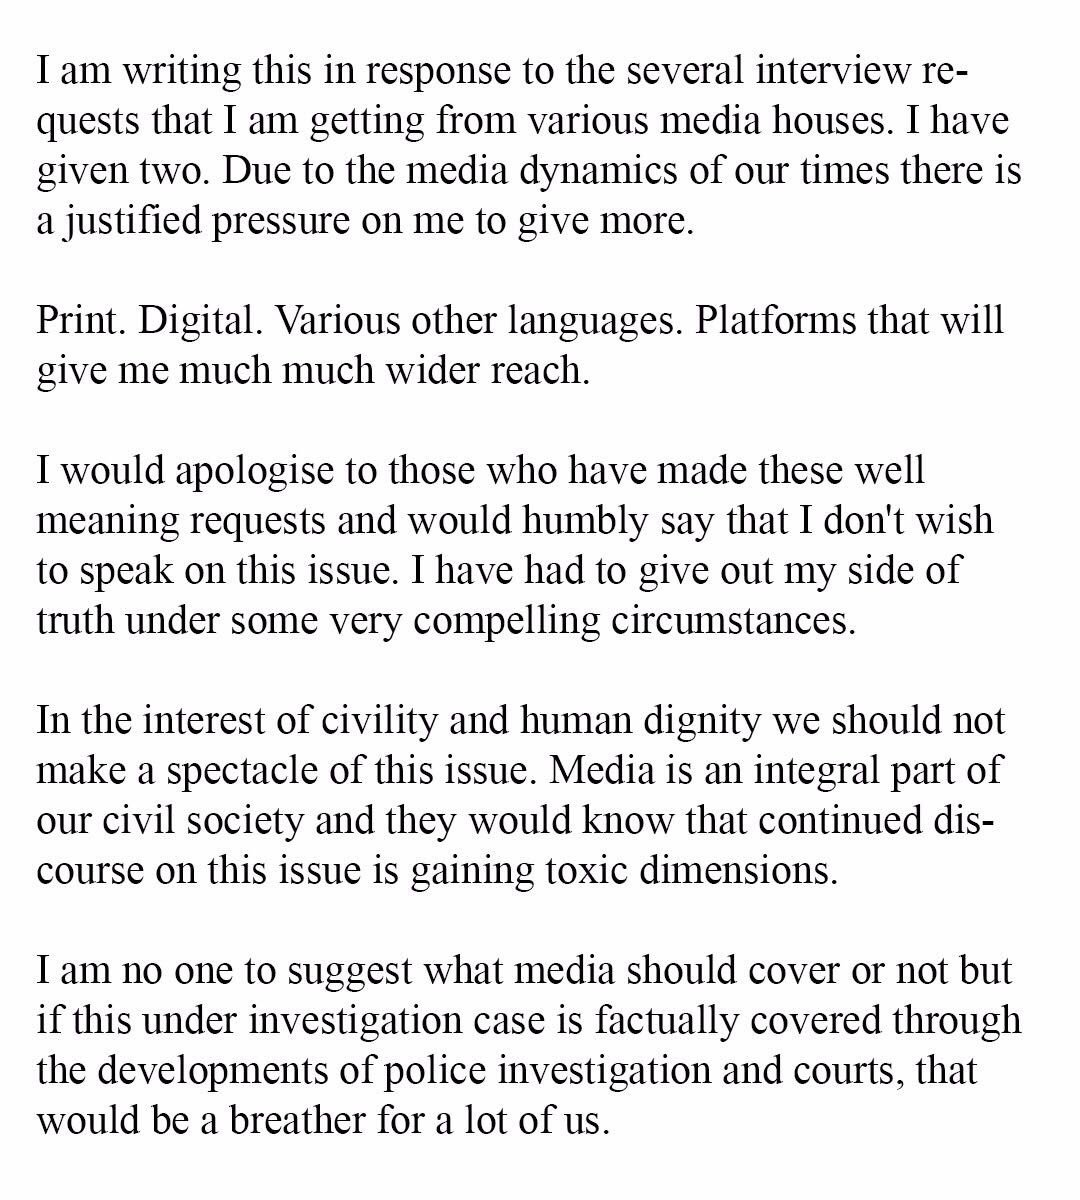 Hrithik Roshan's statement